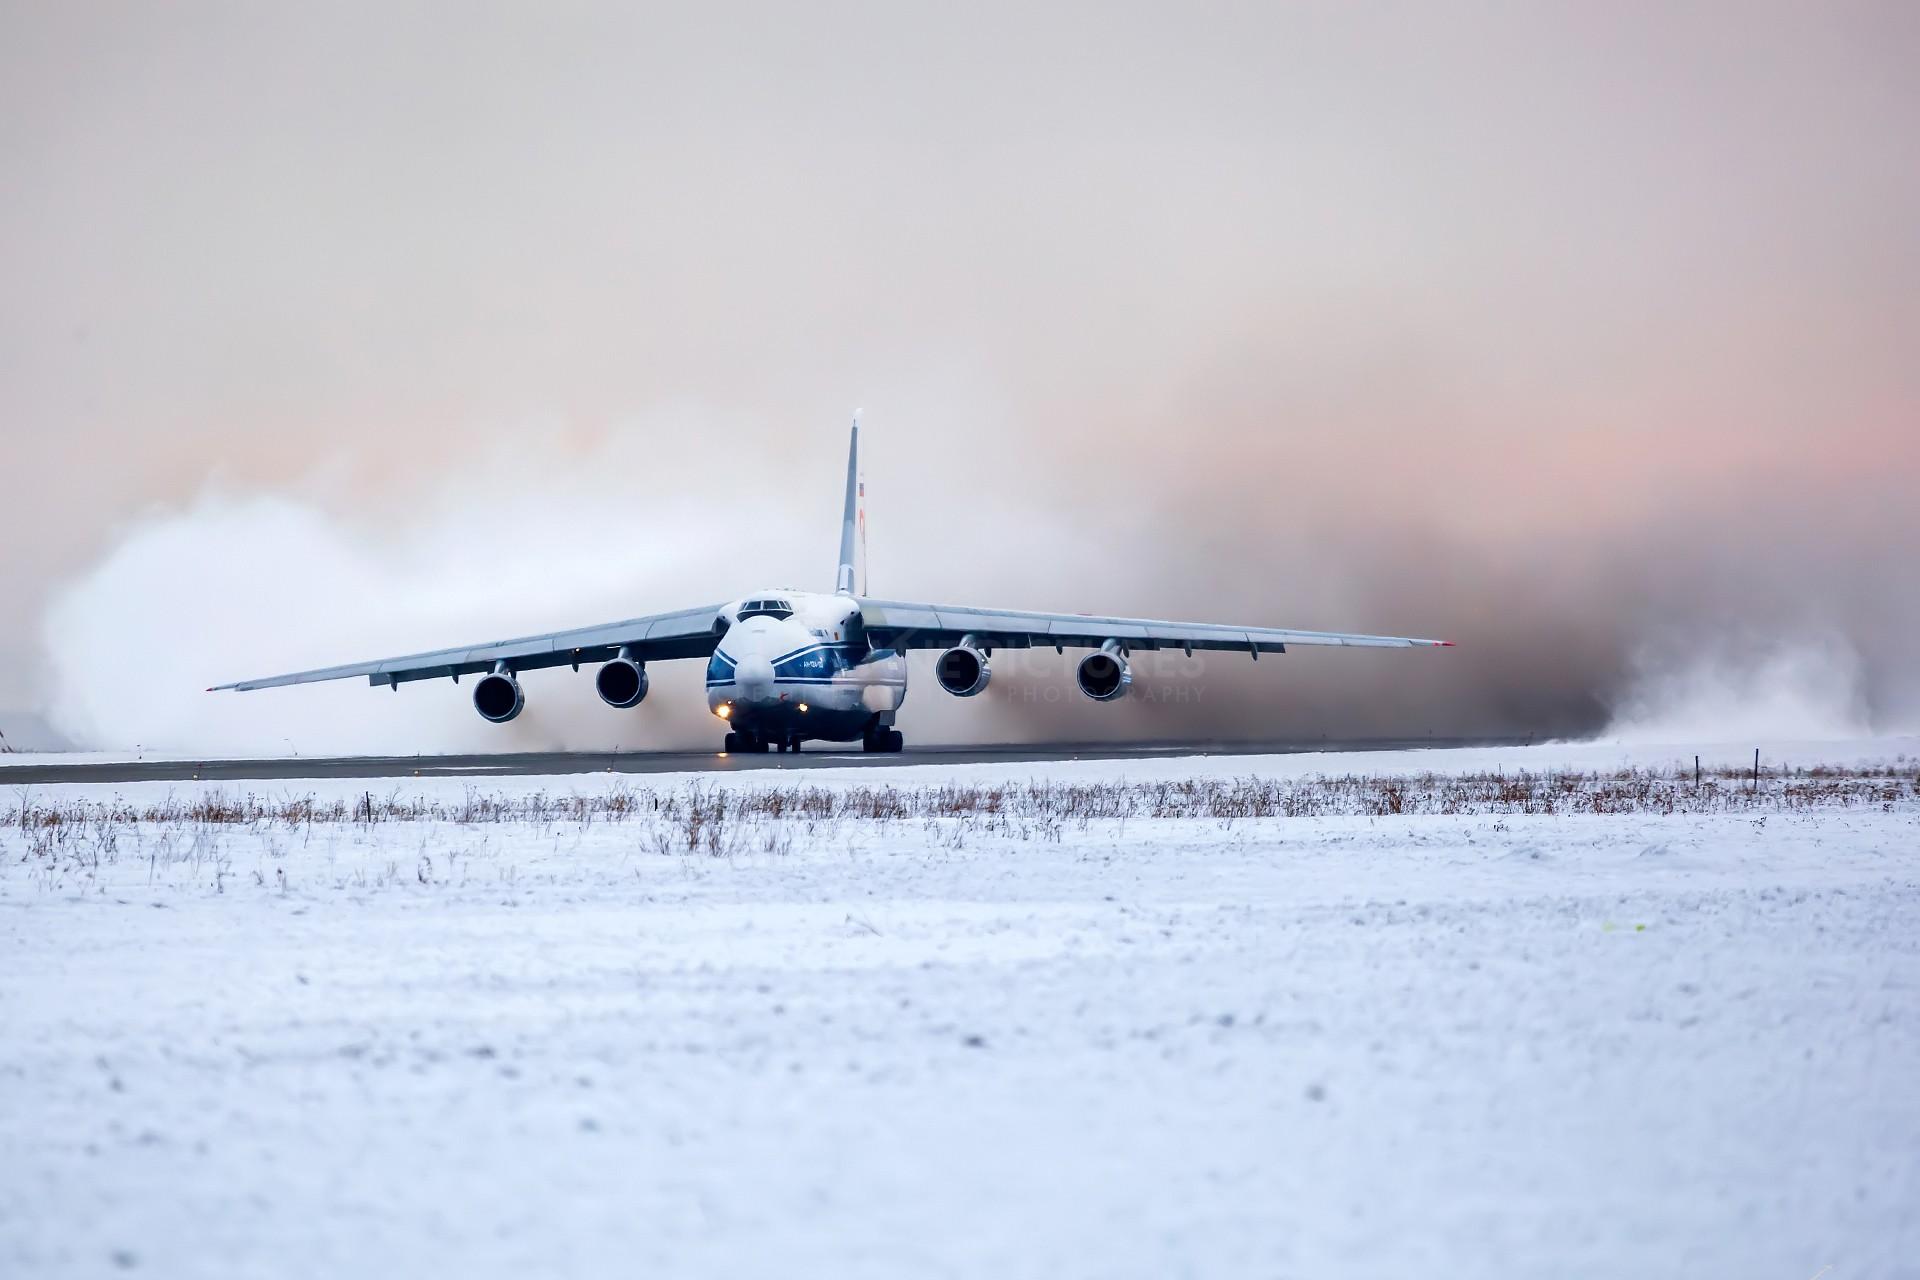 General 1920x1280 aircraft snow airplane runway an-124